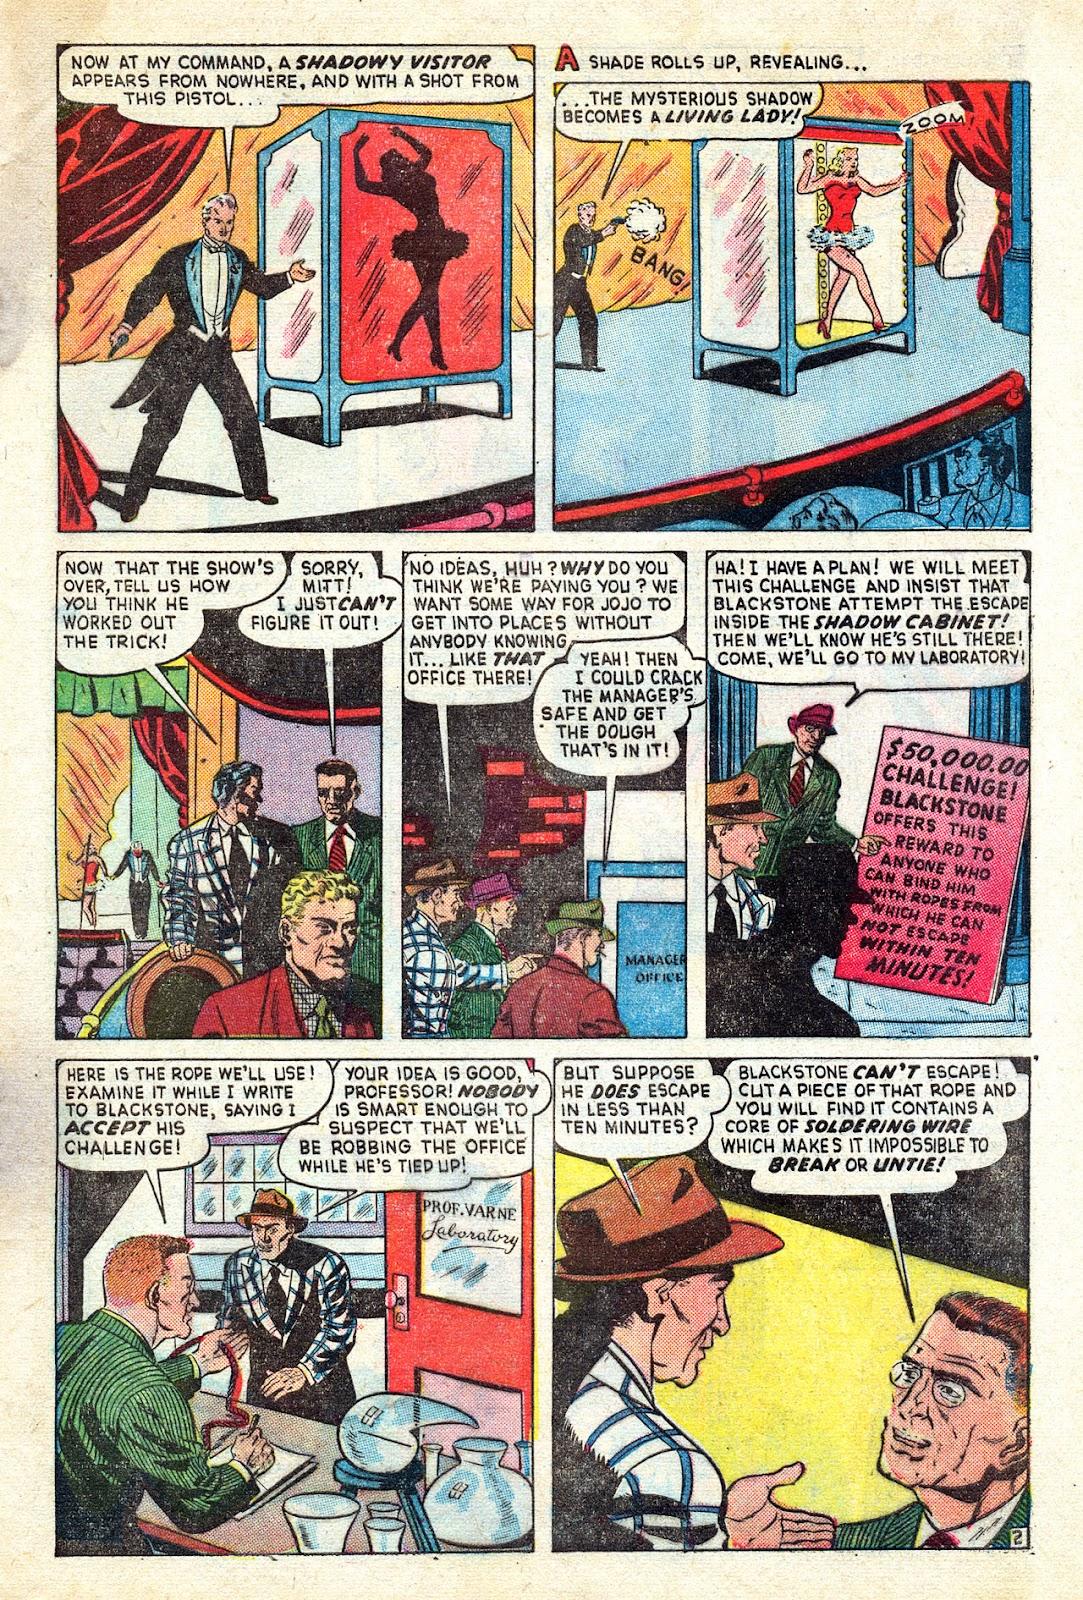 Read online Blackstone the Magician comic -  Issue #4 - 27